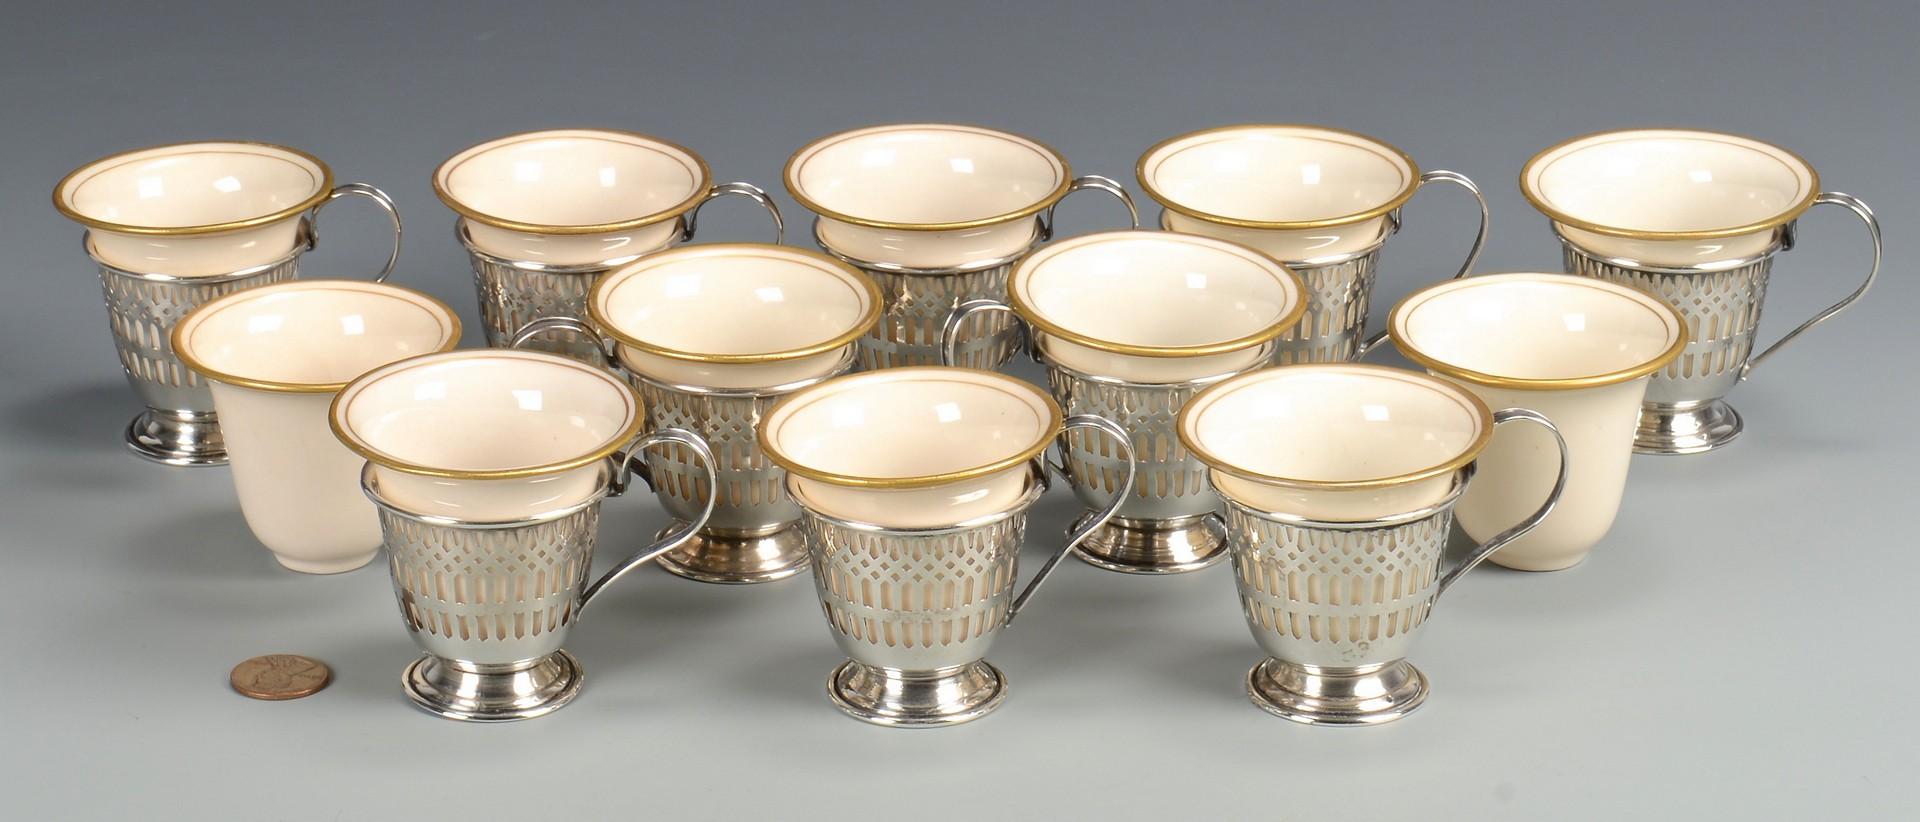 Lot 813: 10 Porcelain and Sterling demitasse cups